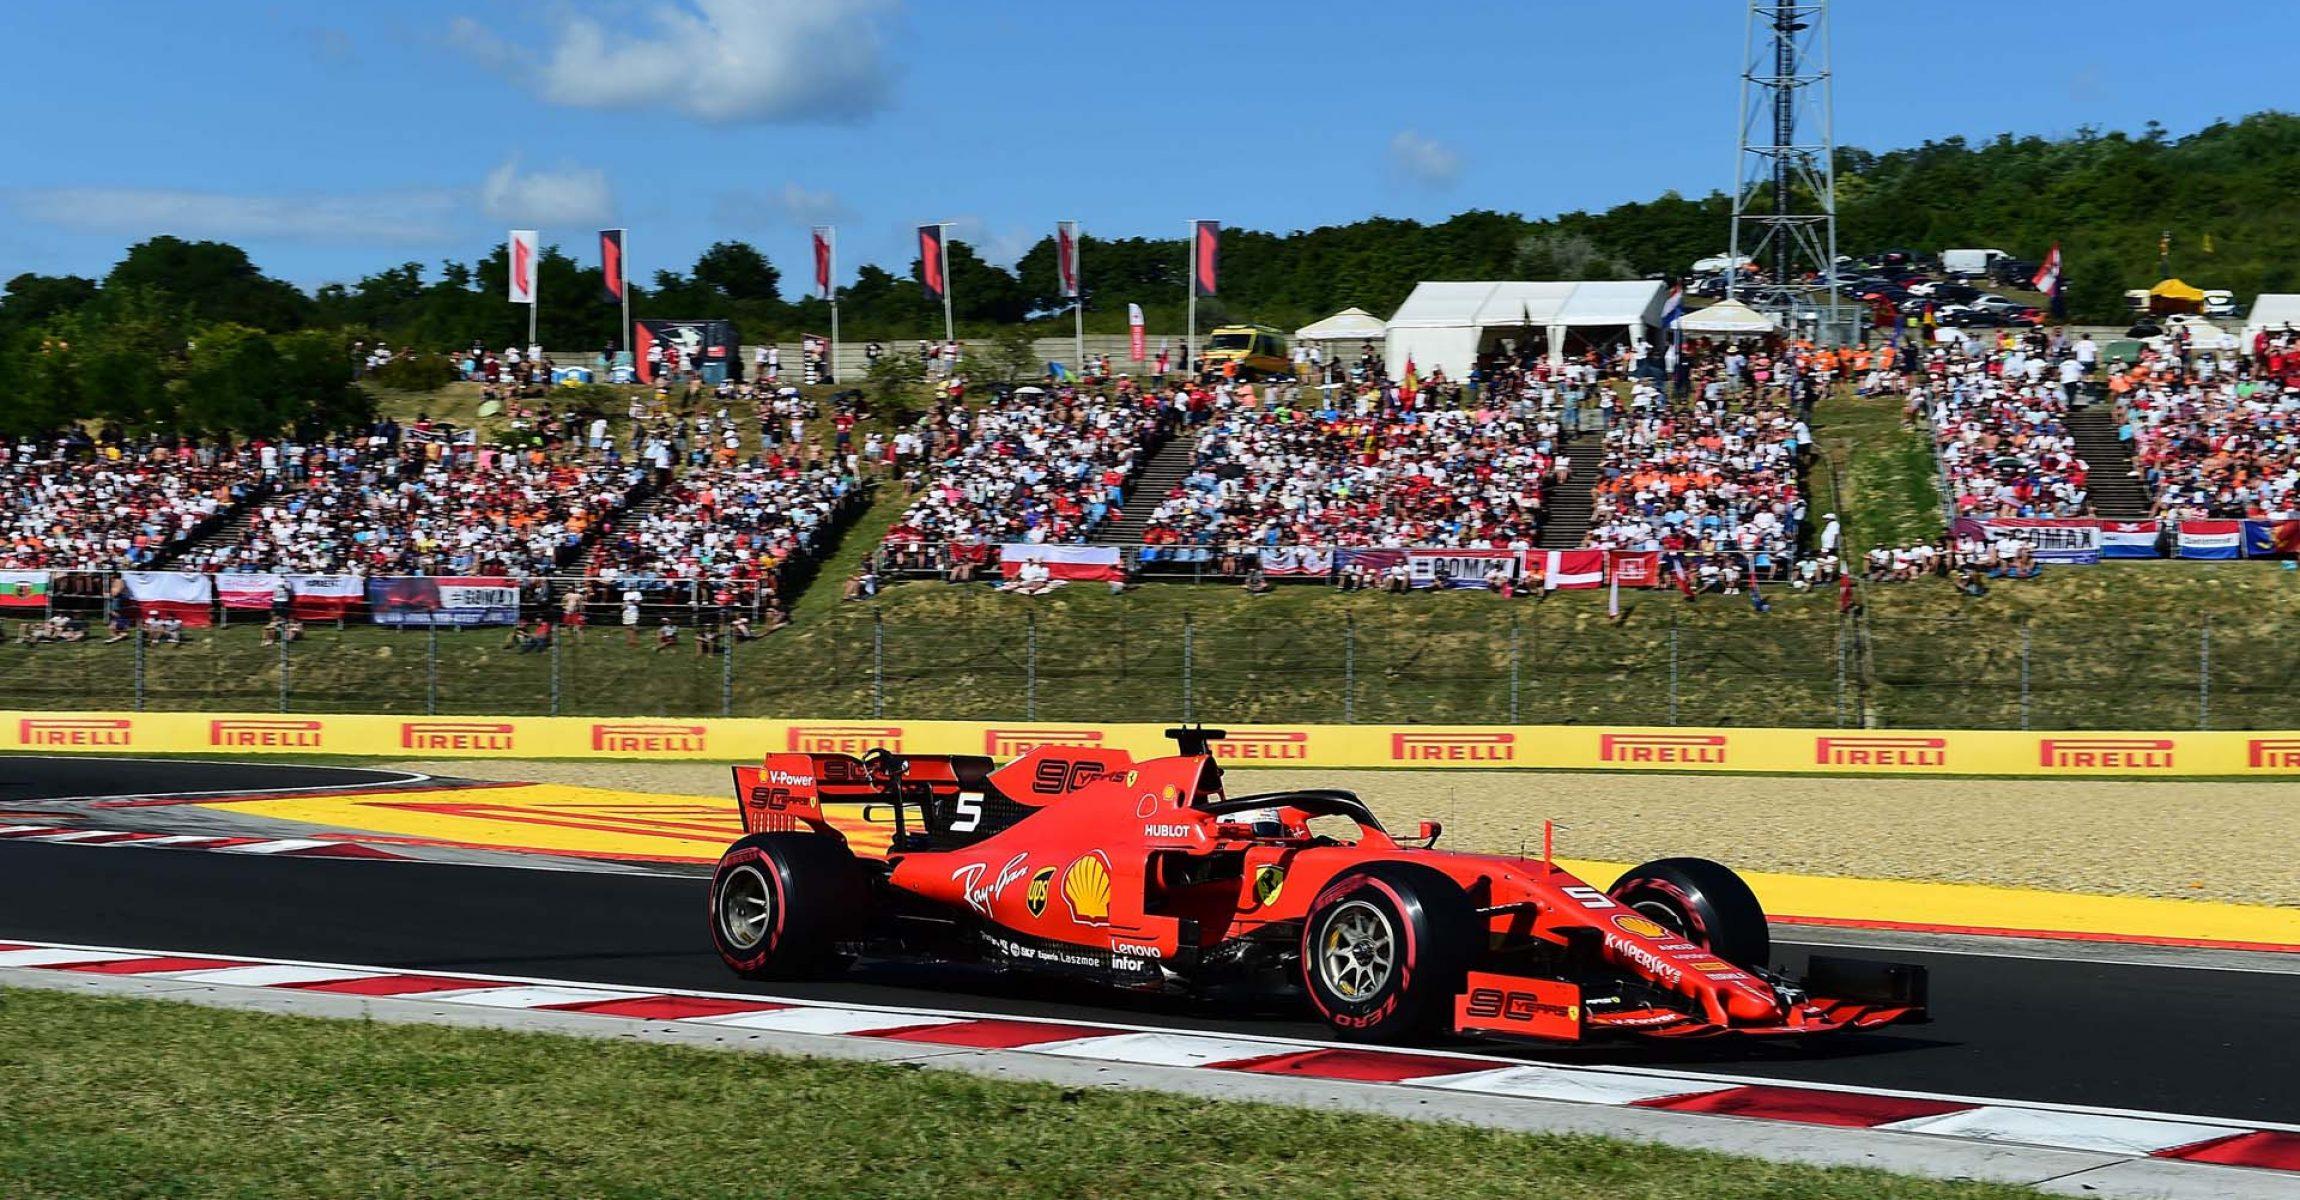 GP UNGHERIA F1/2019 - DOMENICA 04/08/2019 credit: @Scuderia Ferrari Press Office Sebastian Vettel Ferrari